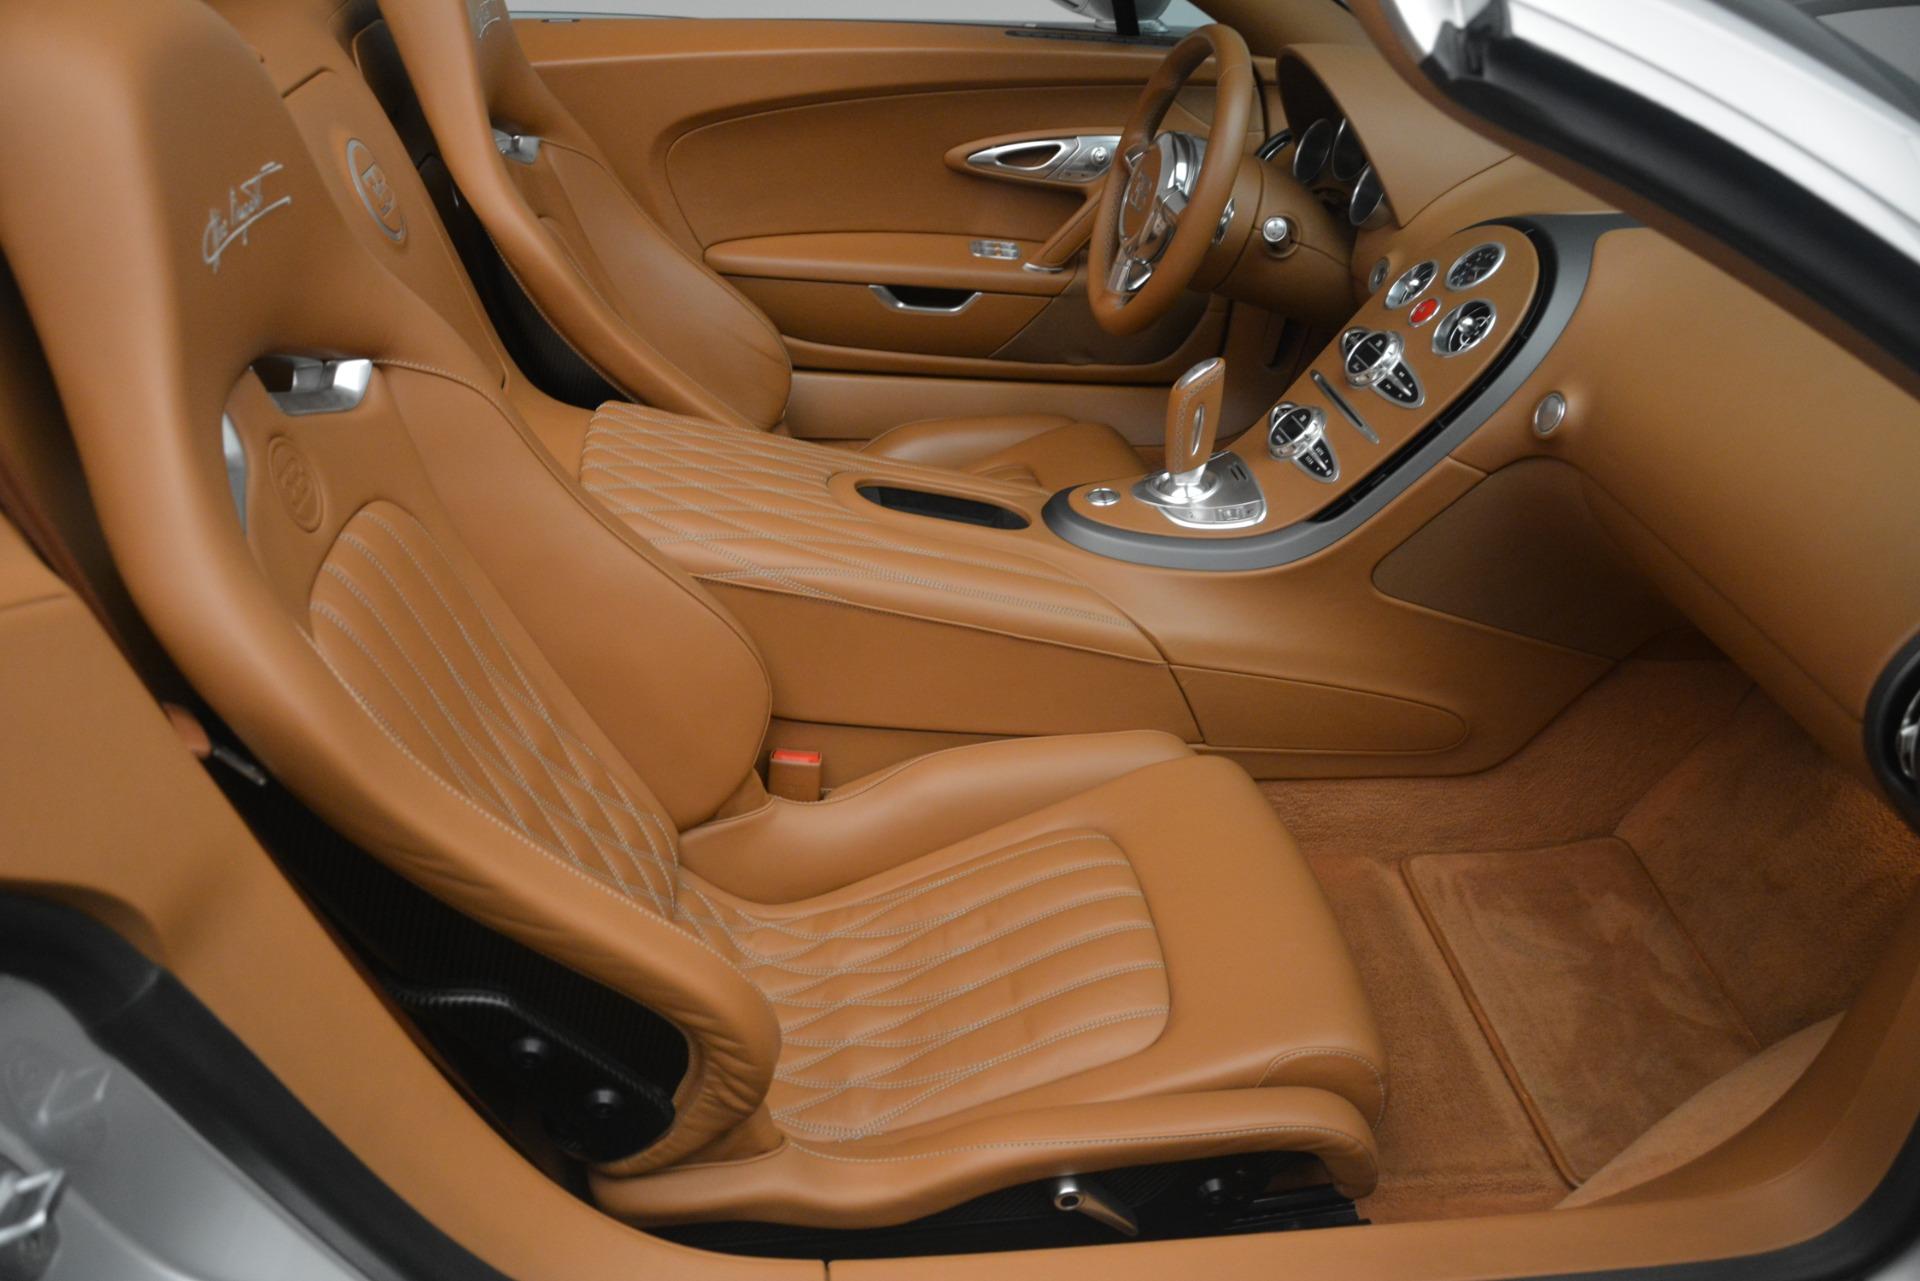 Used 2010 Bugatti Veyron 16.4 Grand Sport For Sale In Greenwich, CT 3159_p34